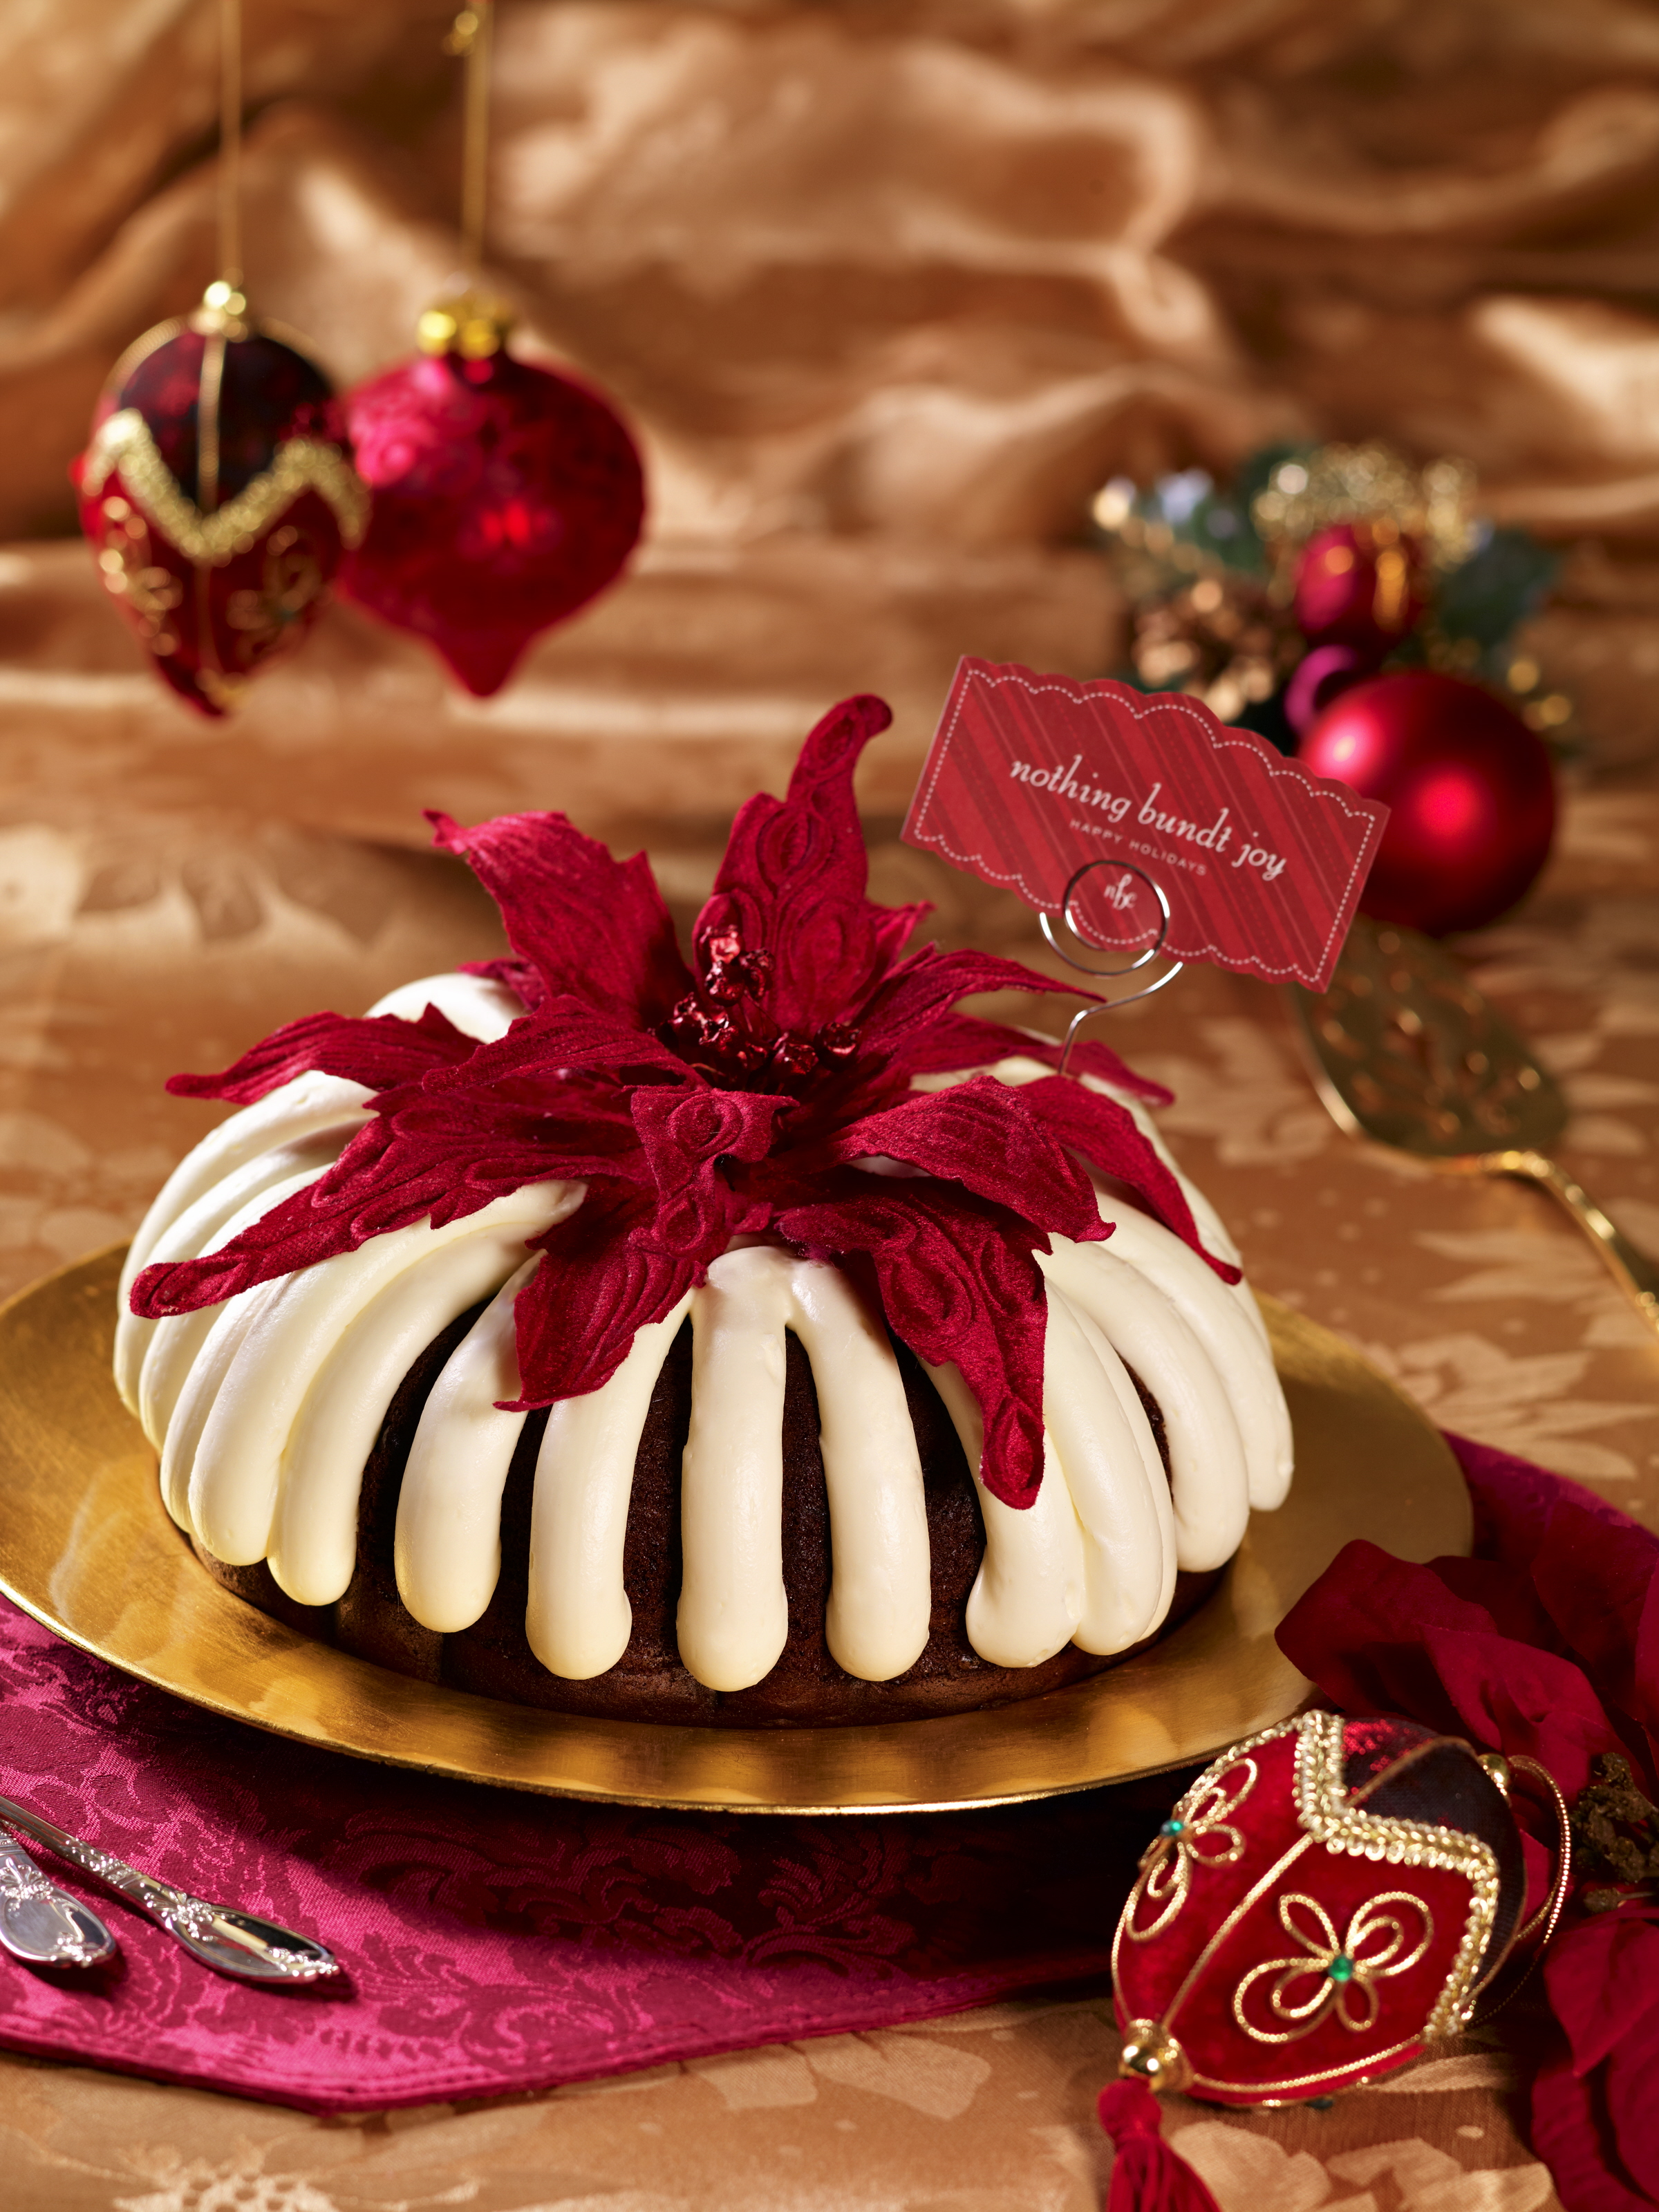 Decorated Bundt Cake Cake Ideas And Designs